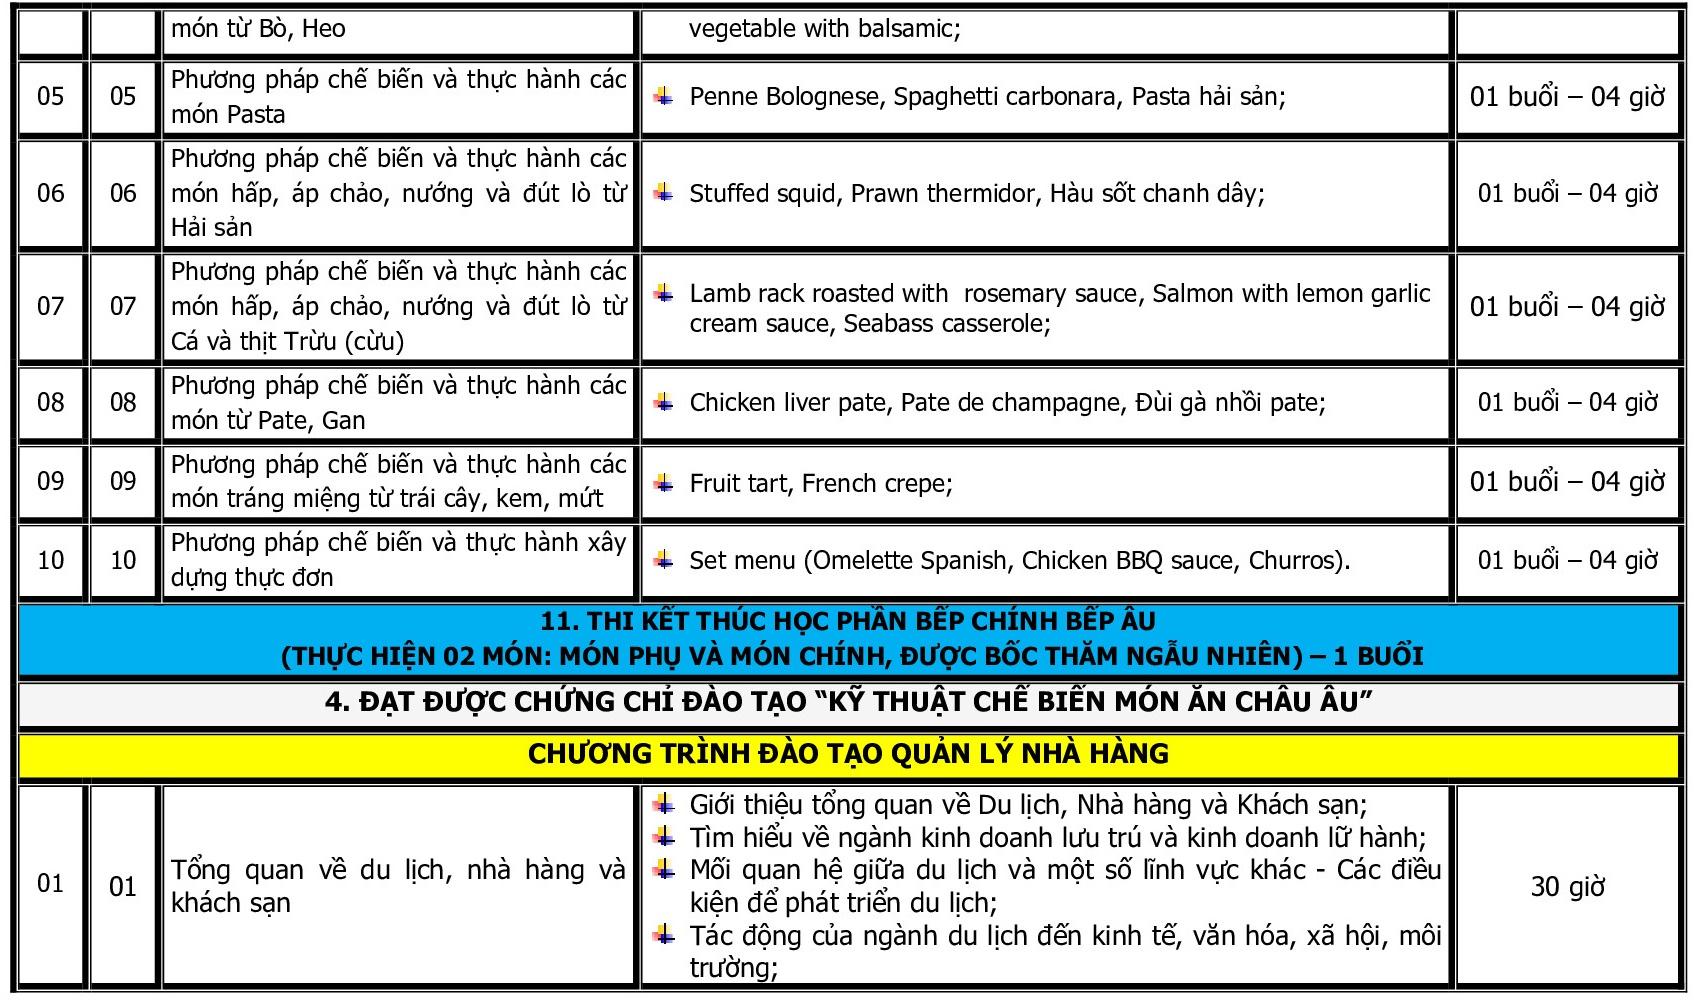 CT DAO TAO THUC HANH BAC TRUNG CAP_p012